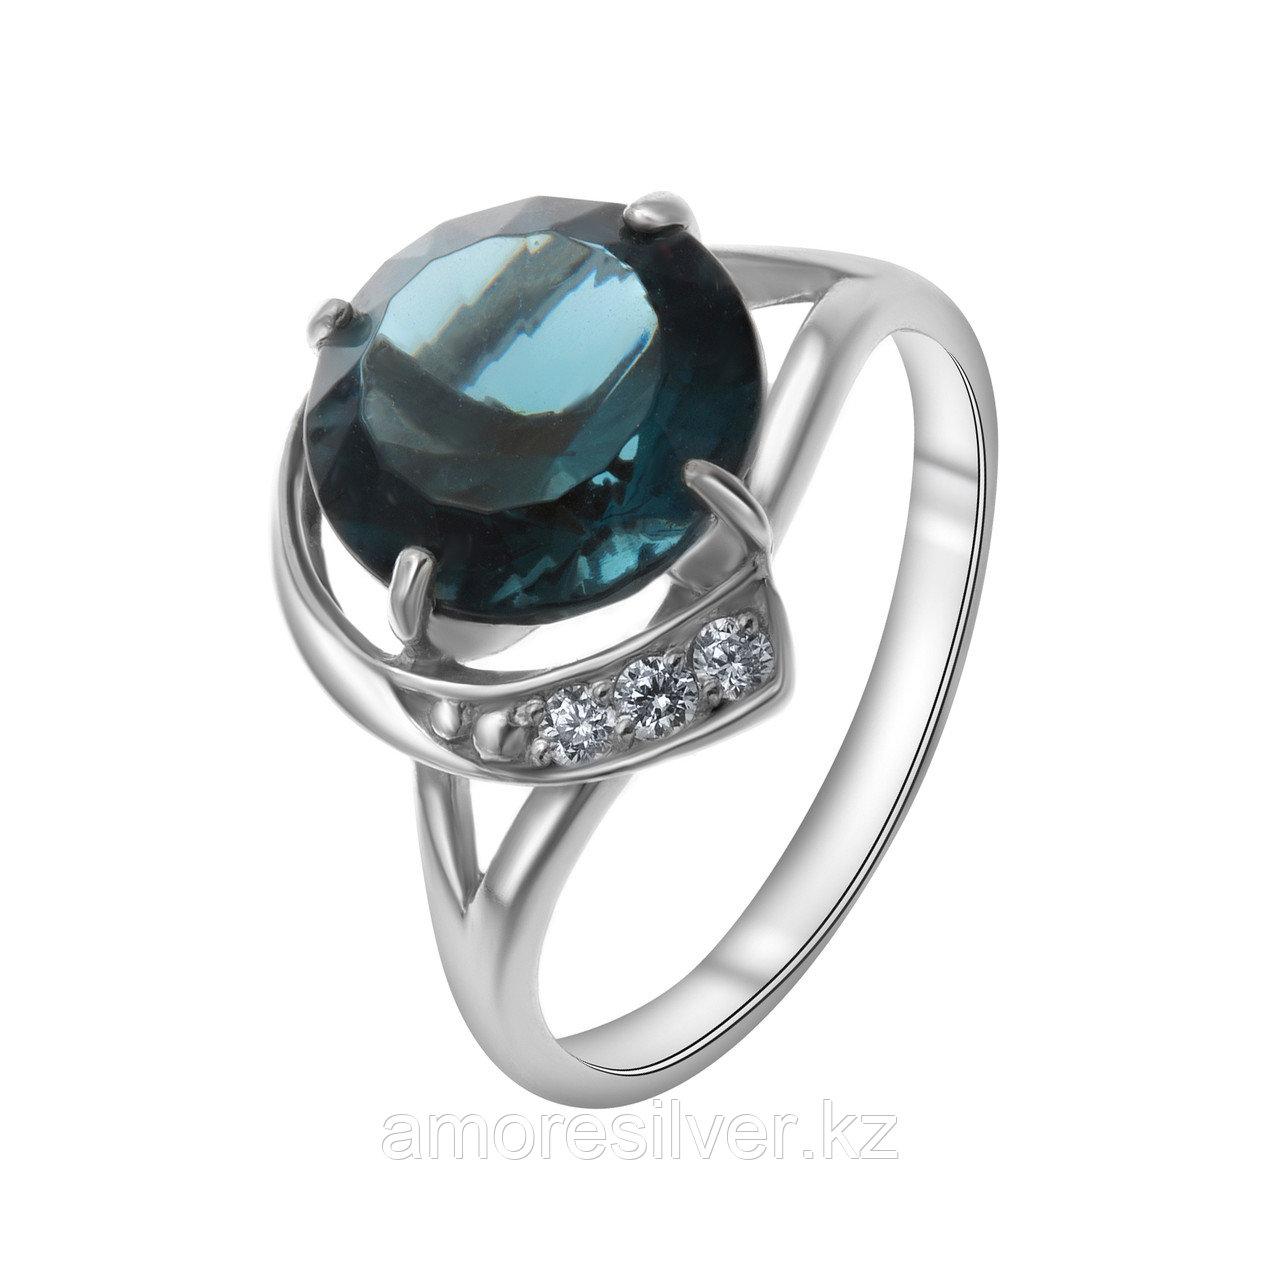 "Кольцо Алмаз-Групп серебро с родием, кварц пл. топаз лондон фианит, ""halo"" 11390045"